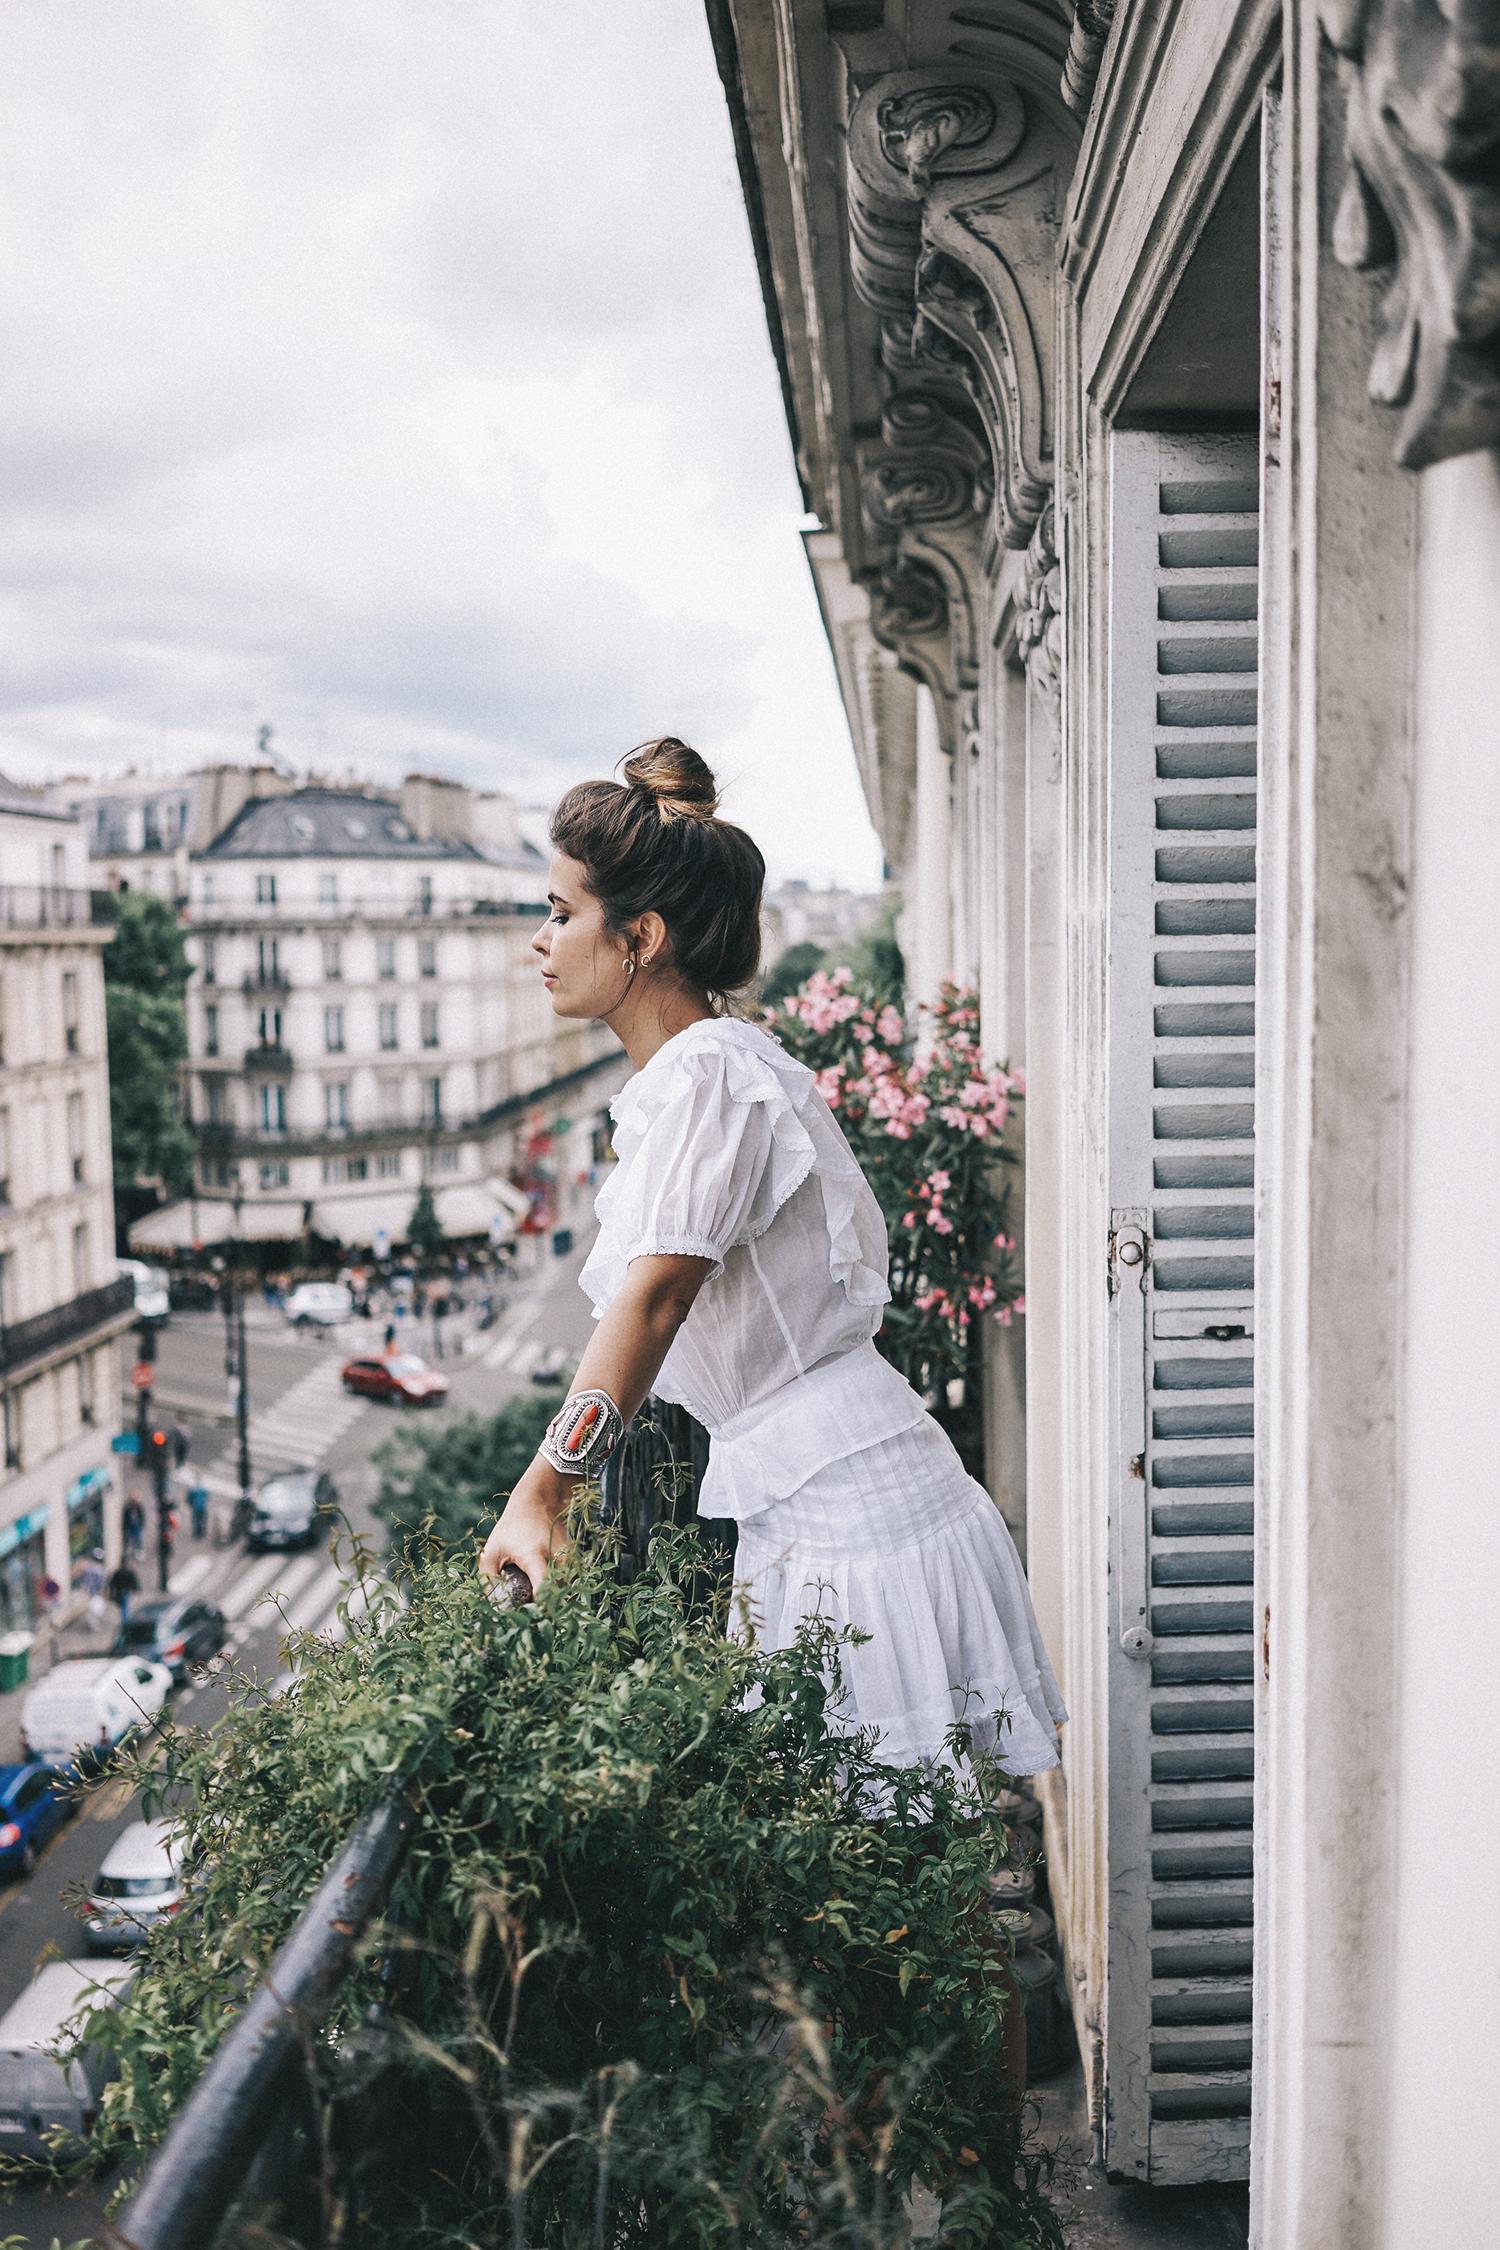 Home_Away-Isabel_Marant_Dress-Outfit-Paris-Collage_Vintage